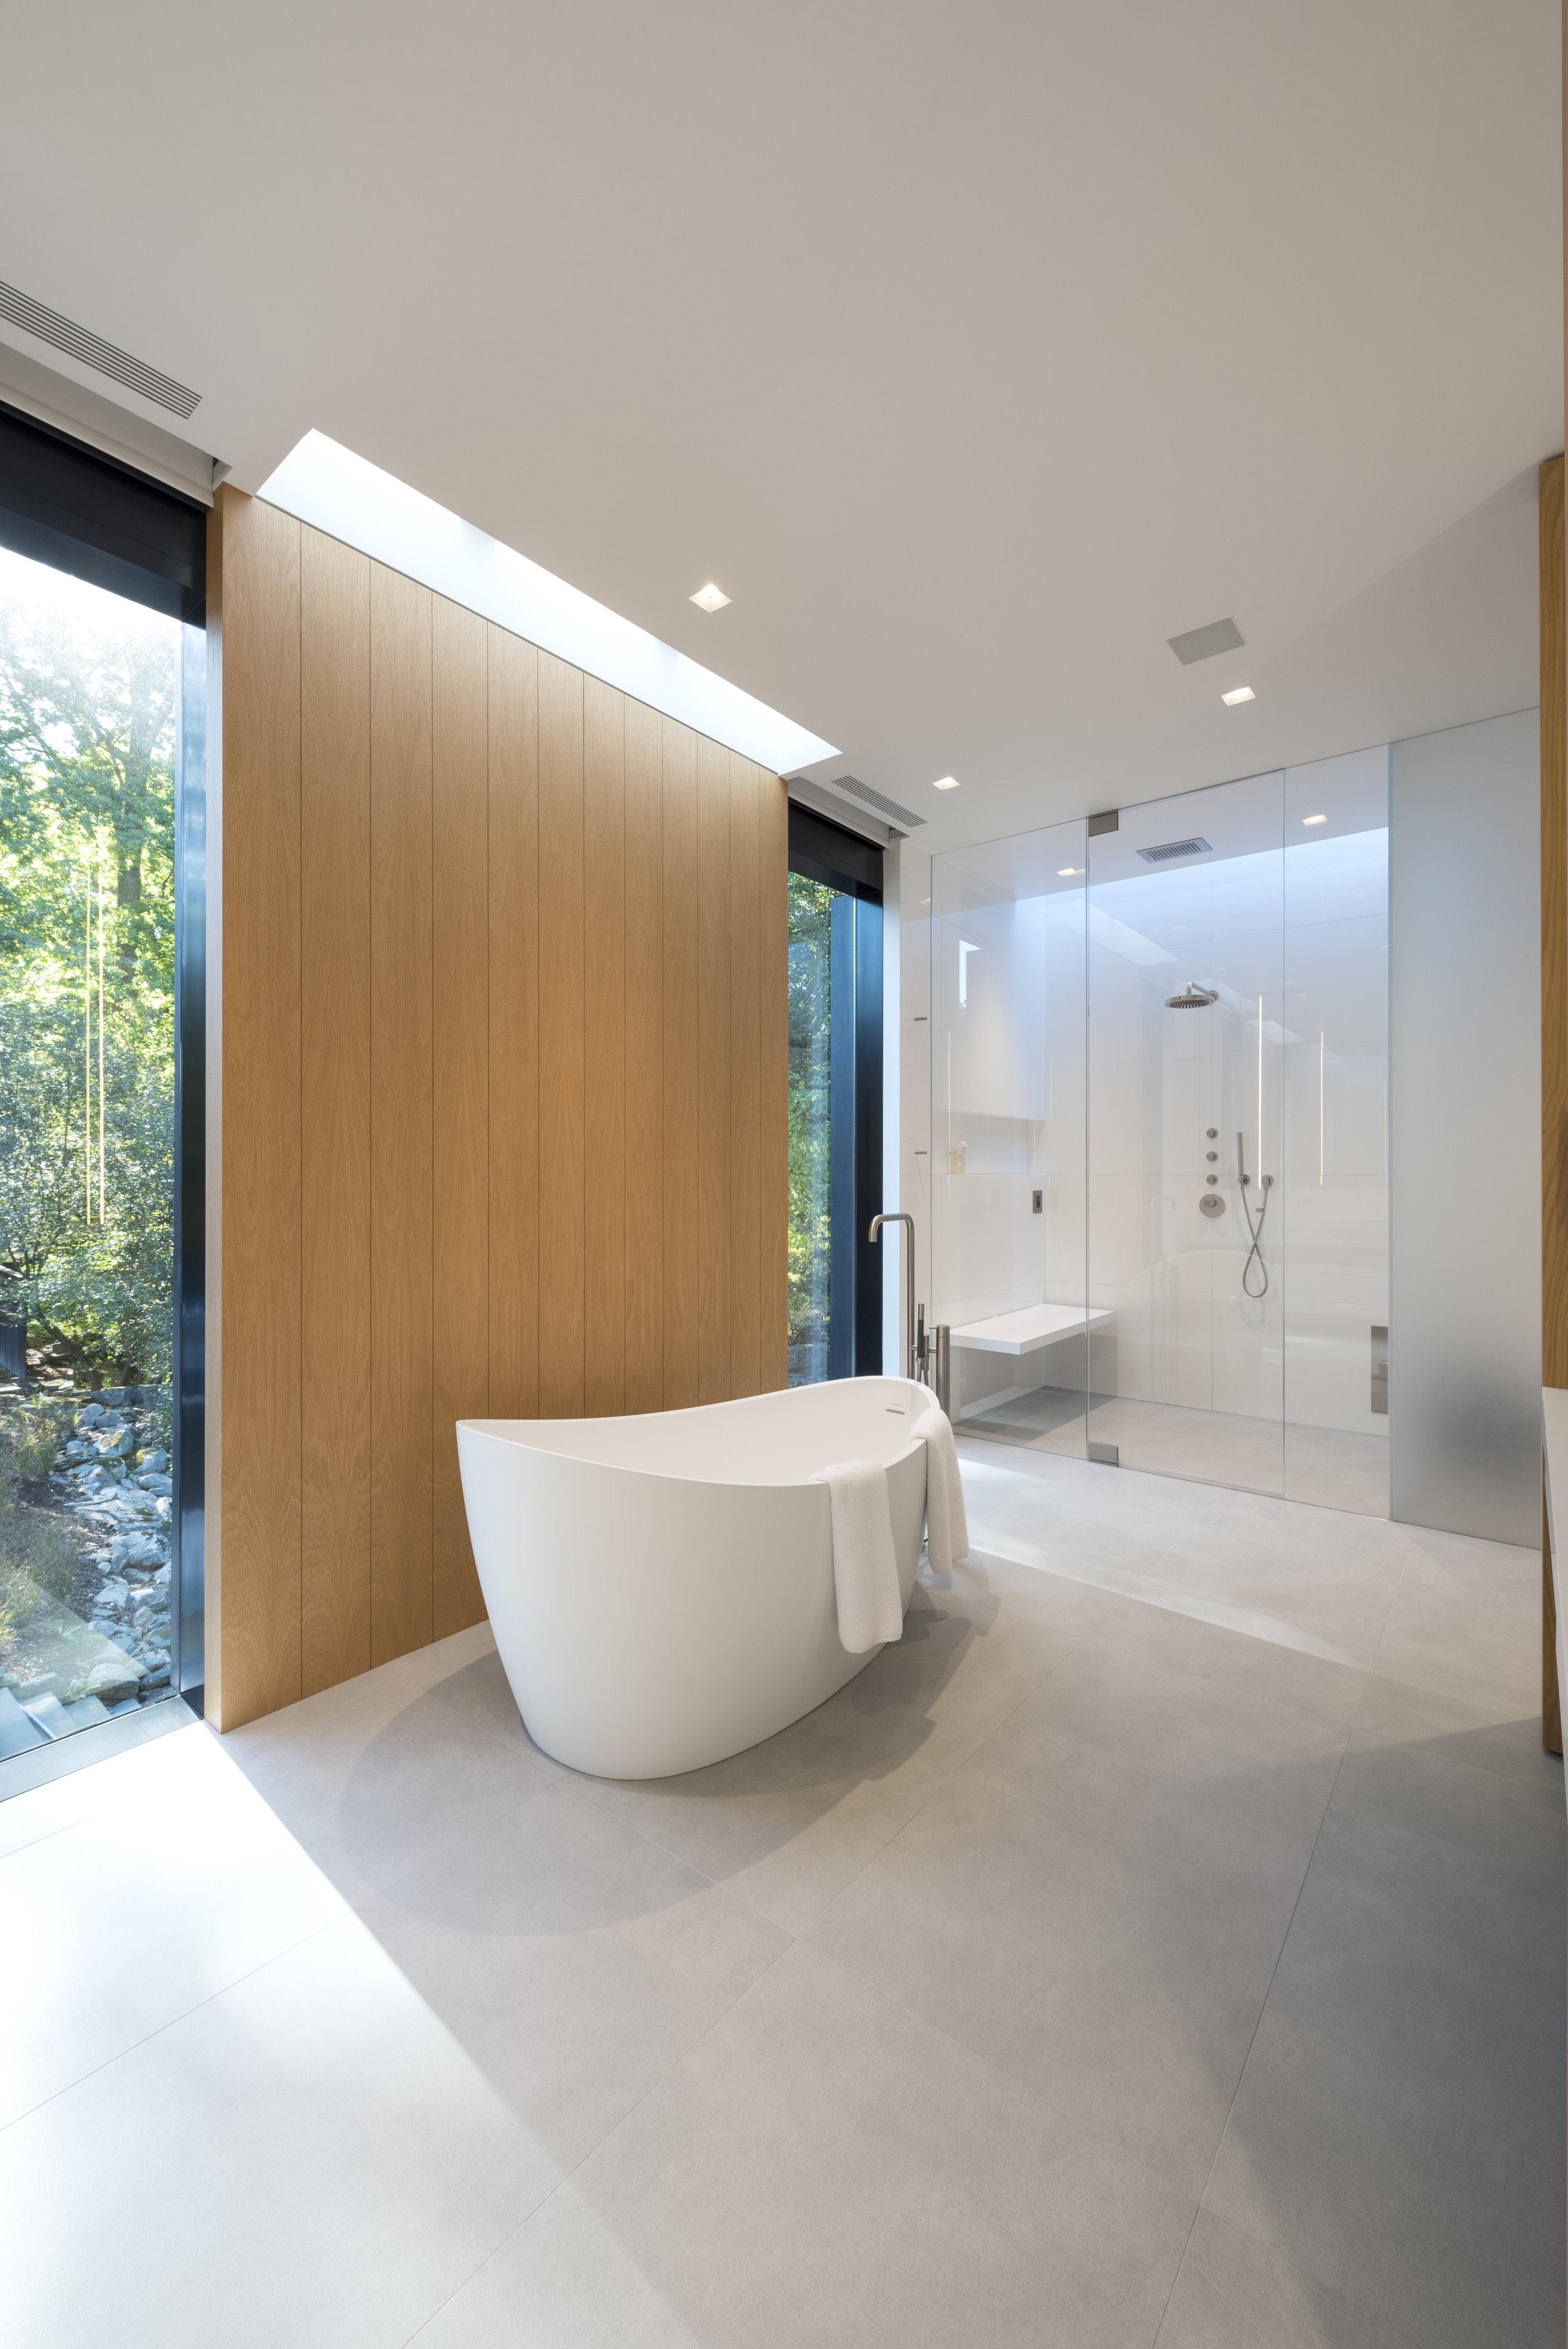 Relaxing custom luxury bath